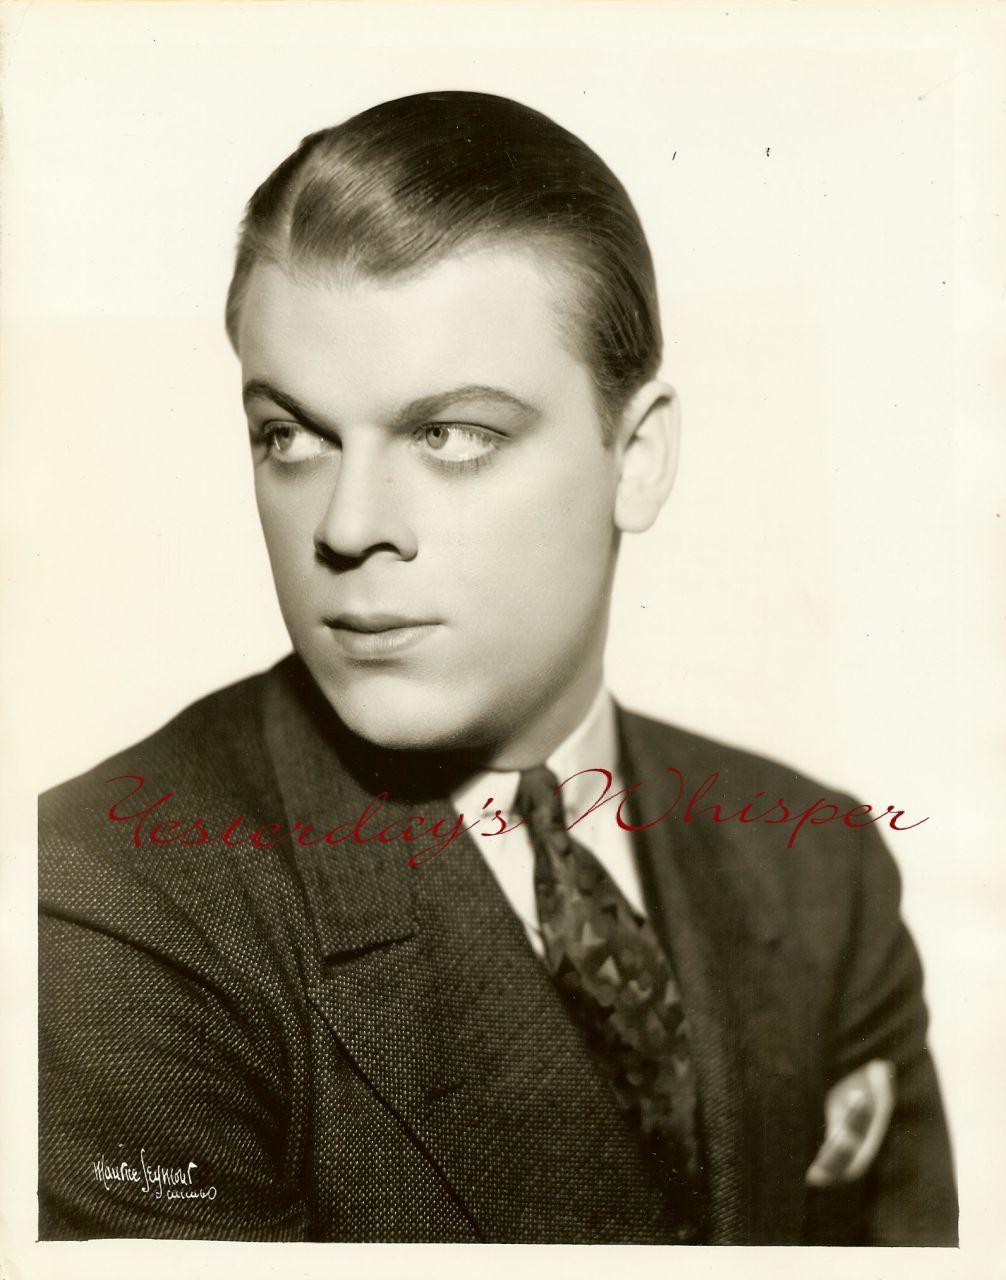 VINTAGE Donald BRIGGS Handsome Maurice Seymour PHOTO